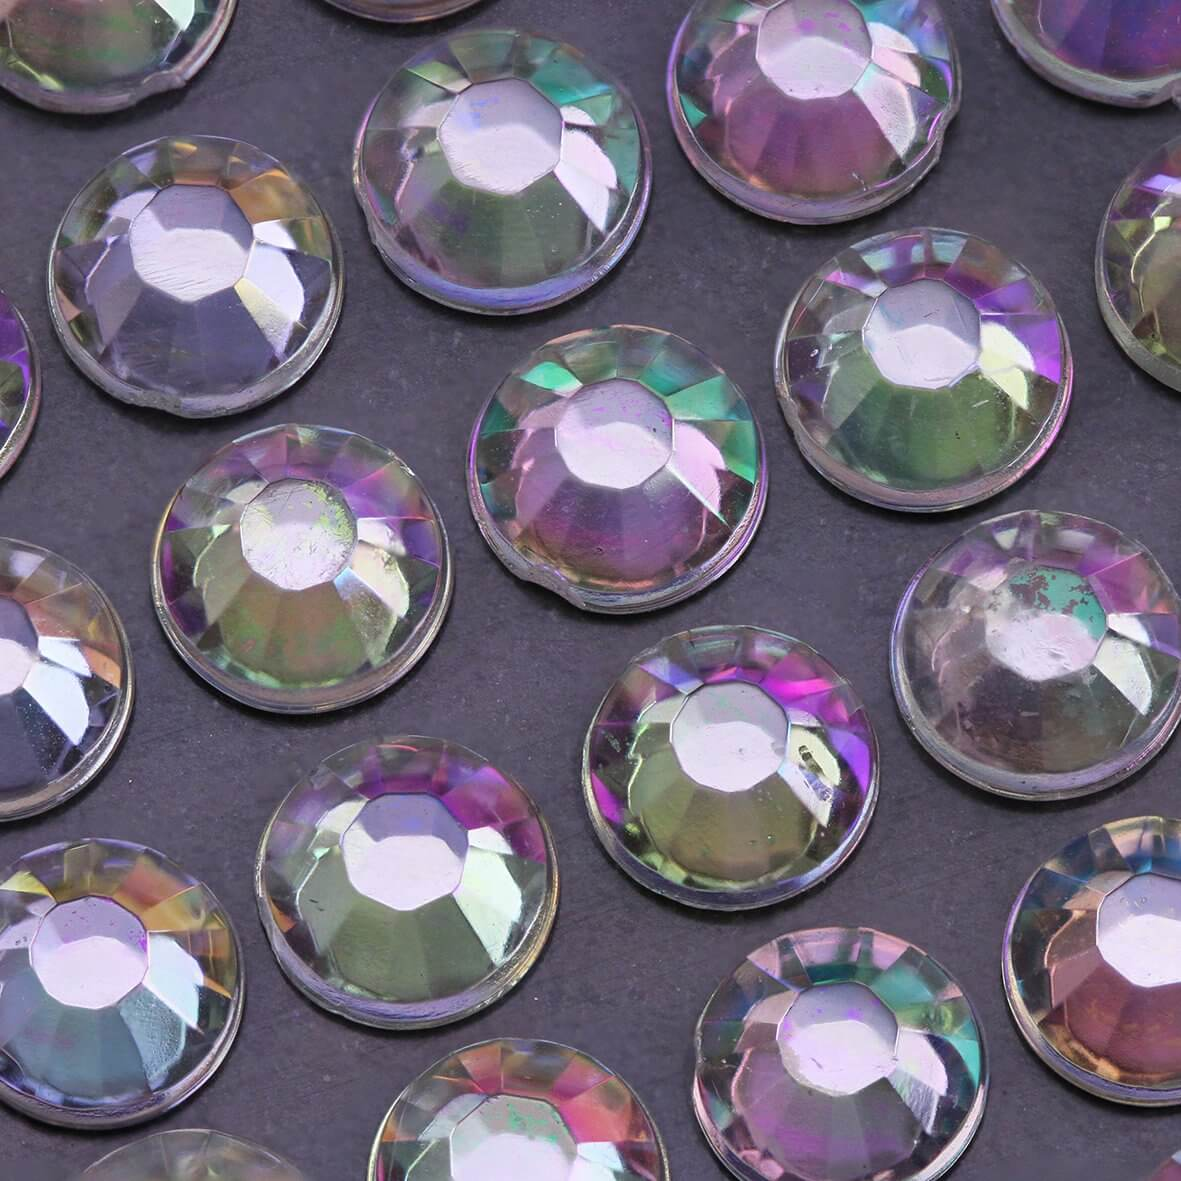 6mm AB Crystal Self Adhesive Diamantes - Zoom